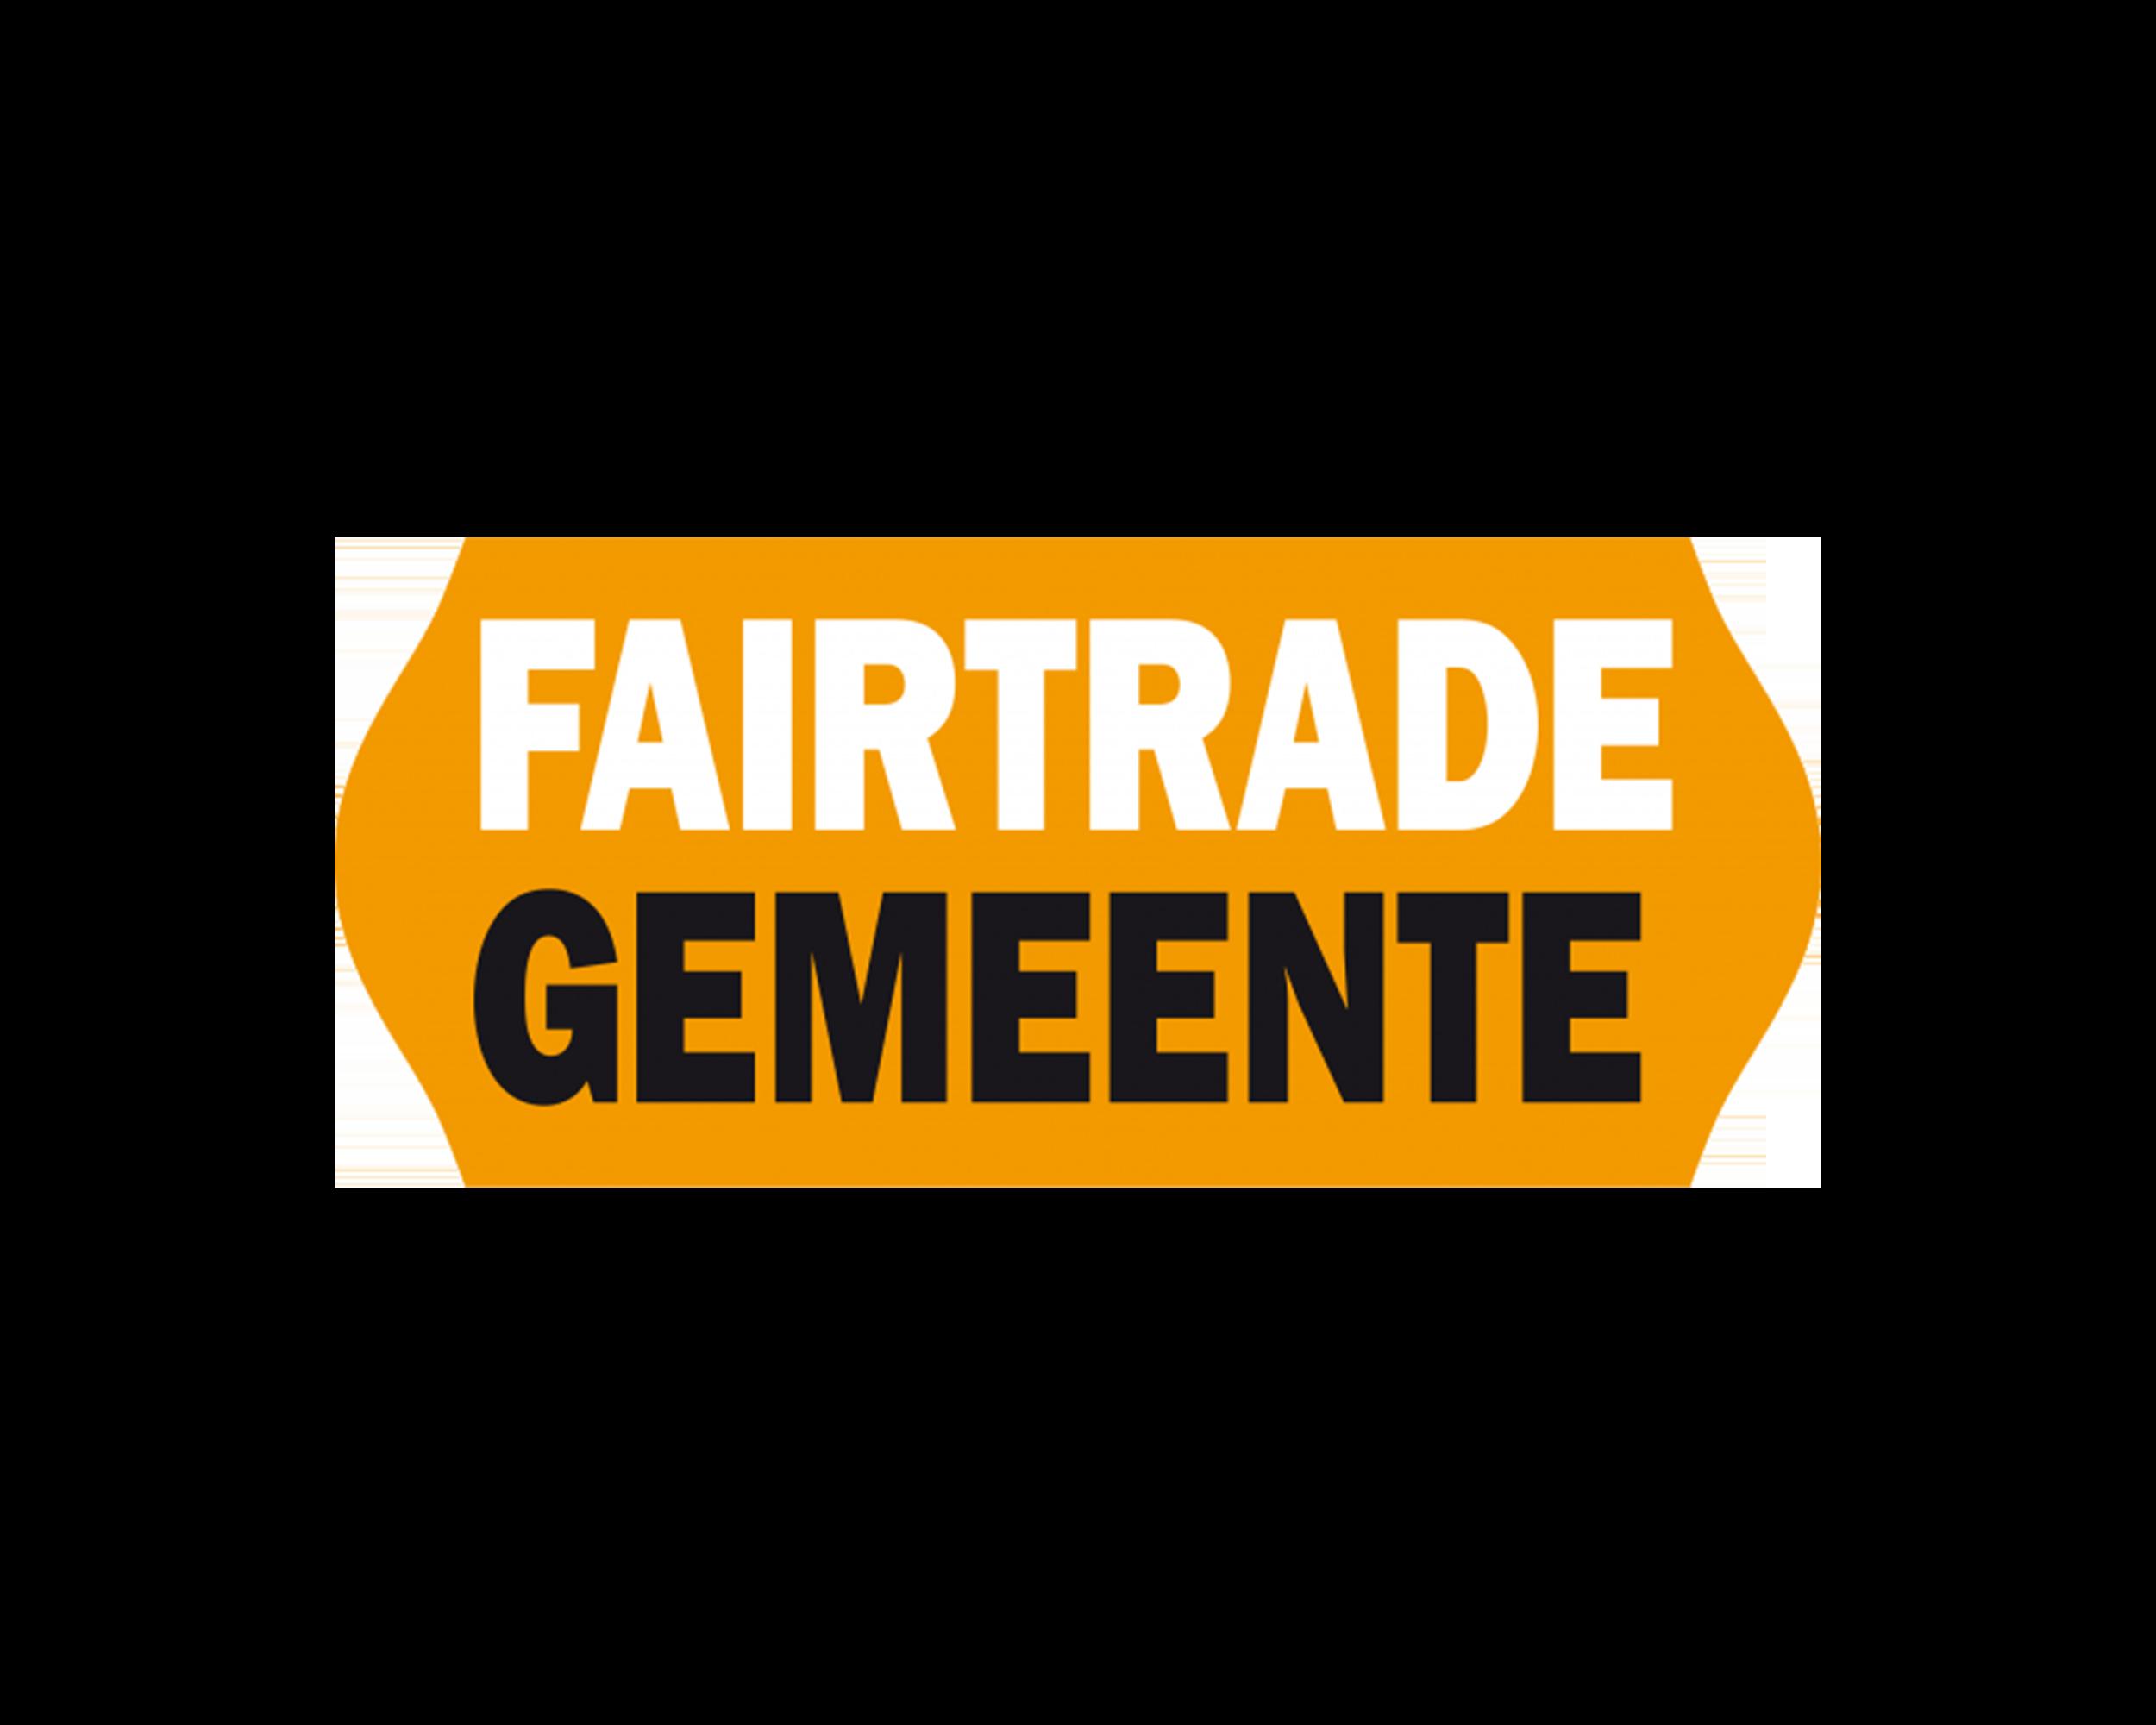 Fairtrade gemeente logo